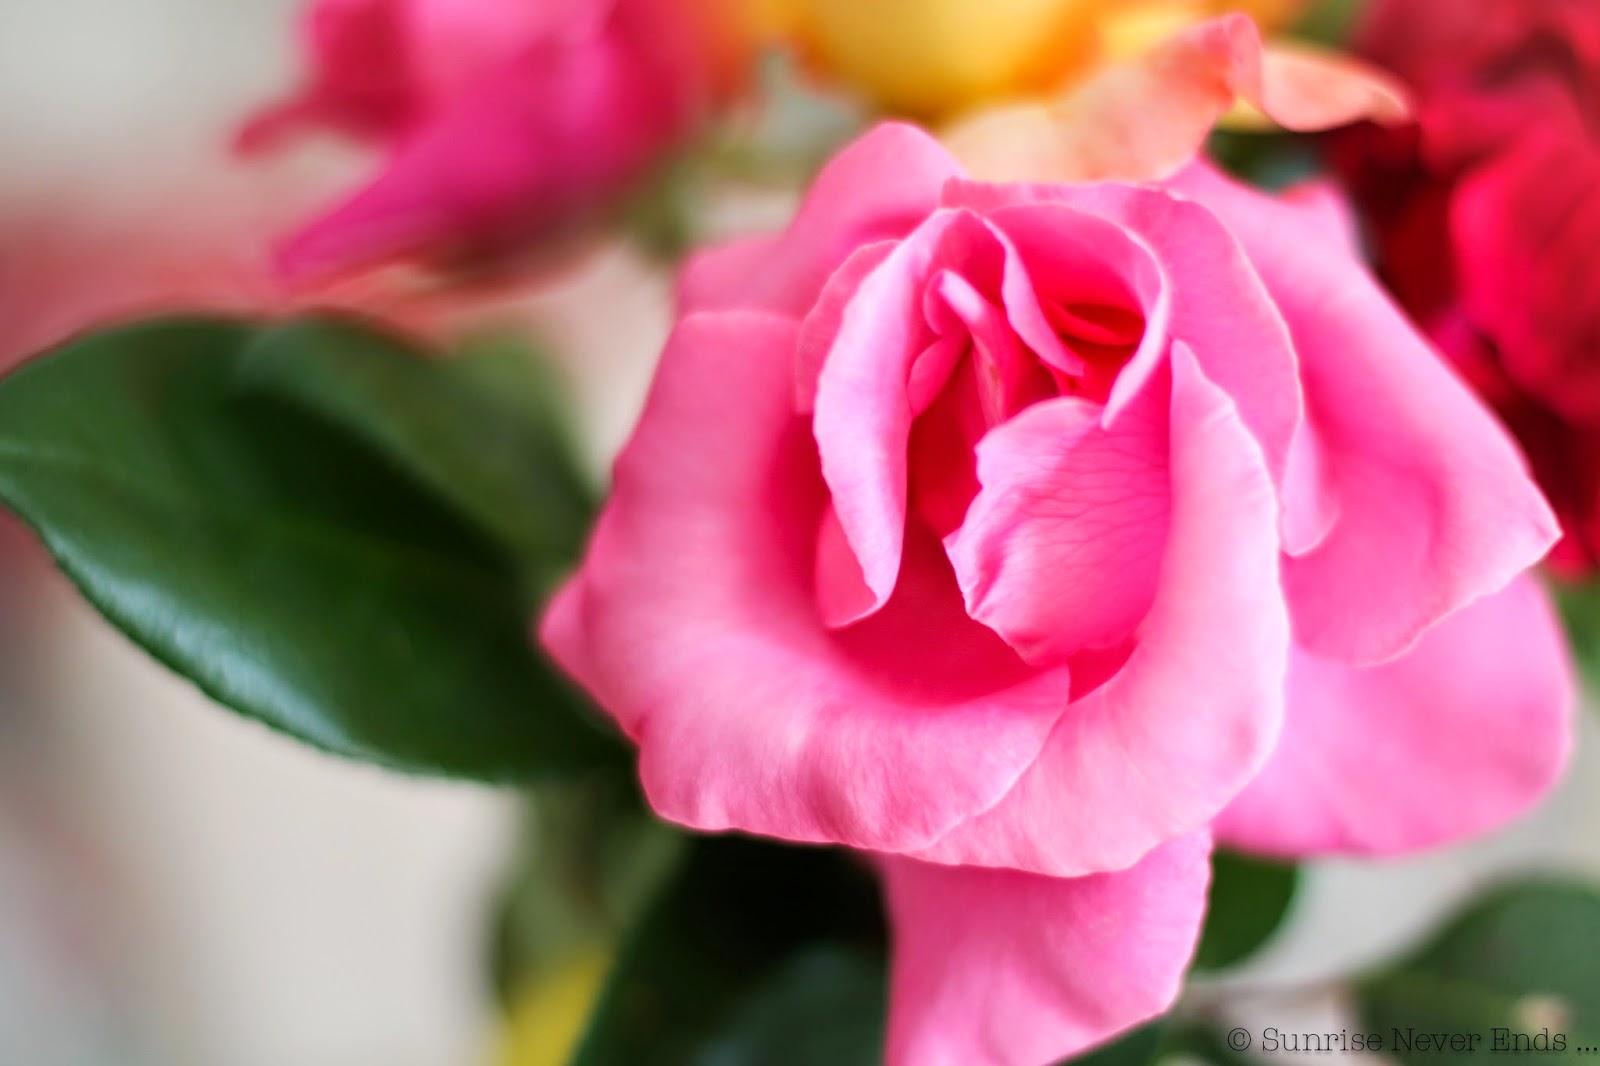 hone sweet home,fleurs,roses,couleurs,life's a beach,martin parr